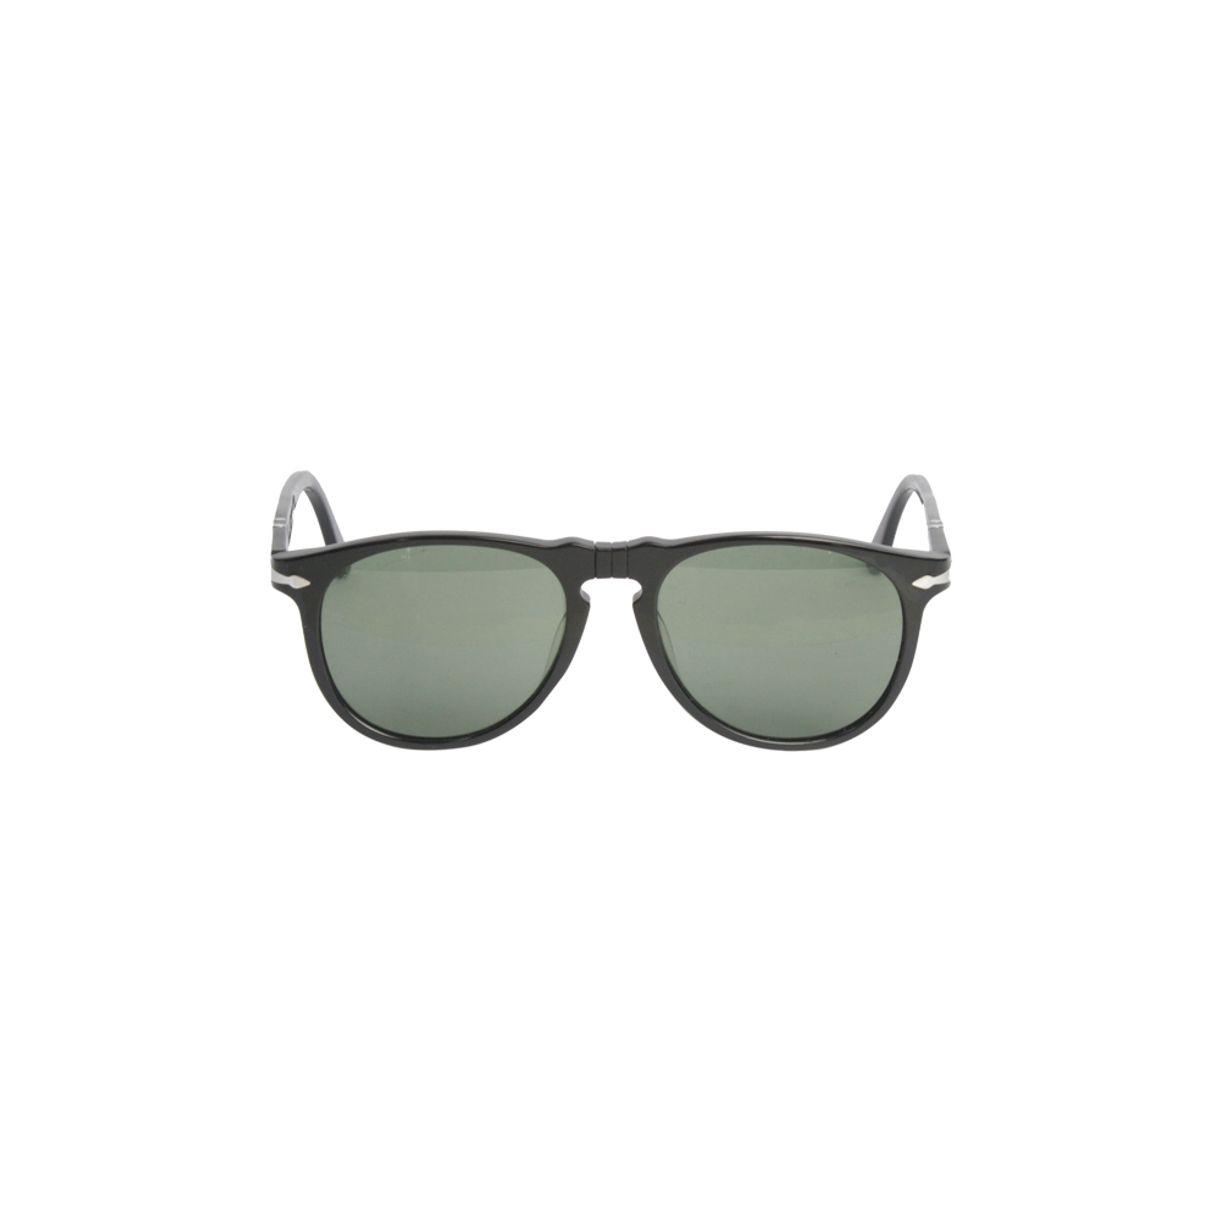 Oculos-Marc-Jacobs-Preto-Metal-Prata